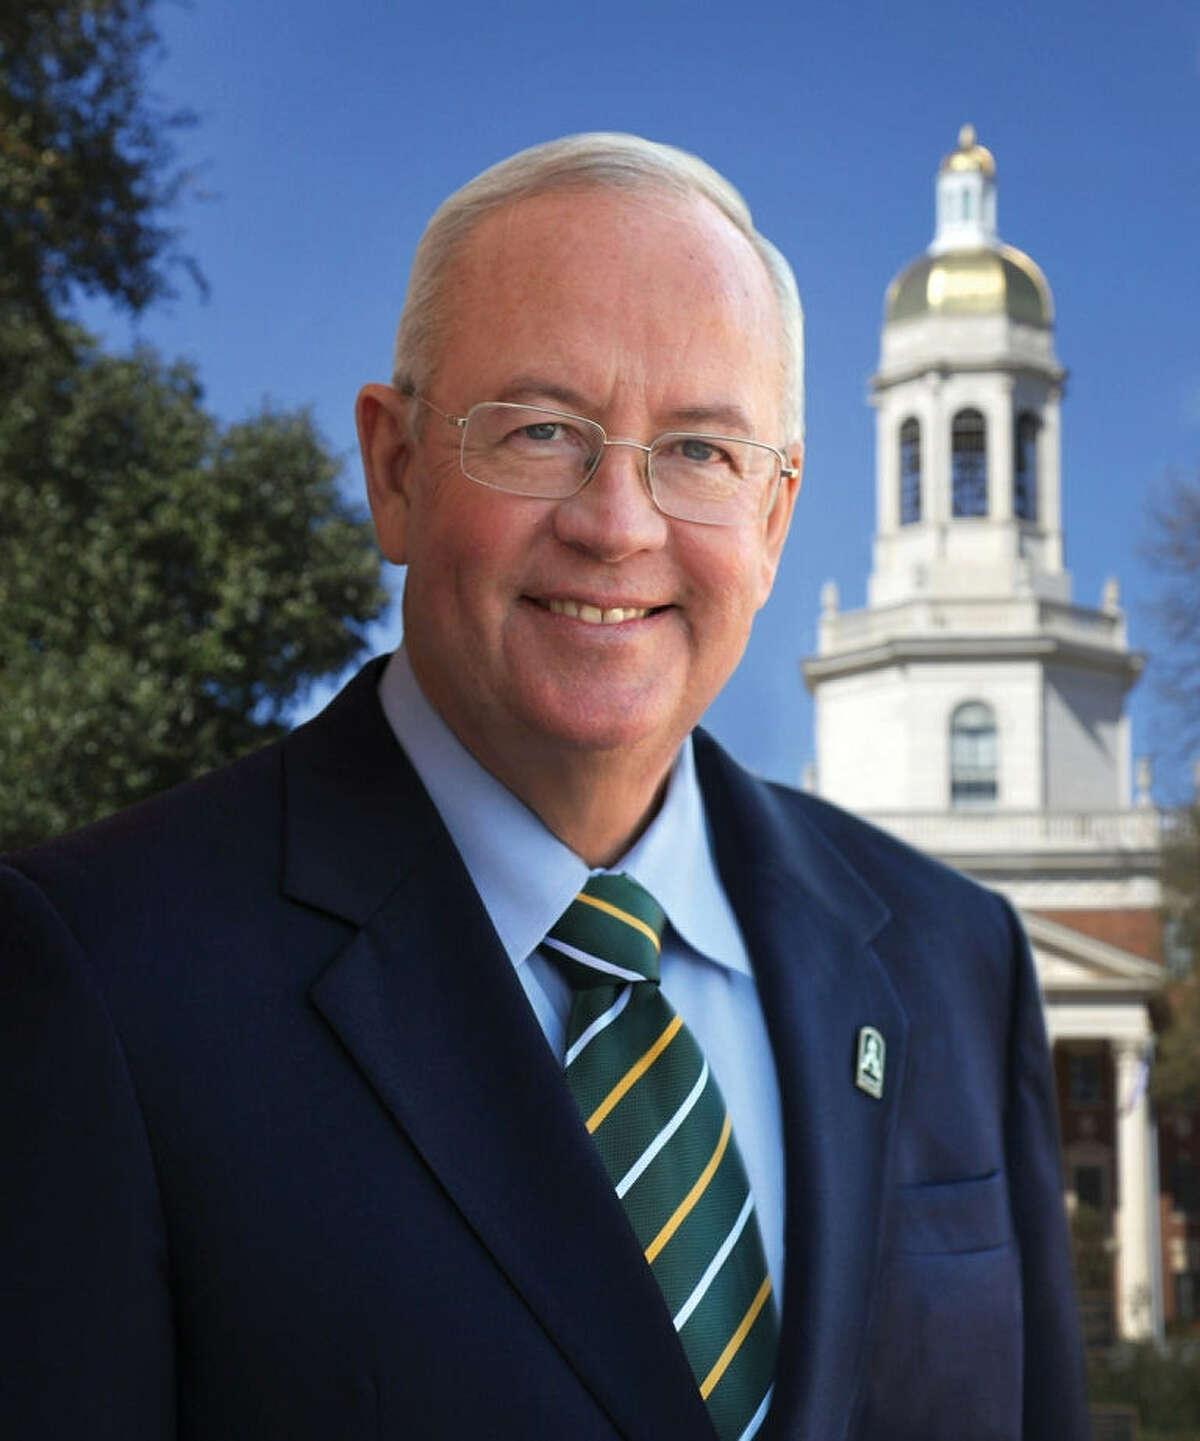 Kenneth Starr is president of Baylor University.